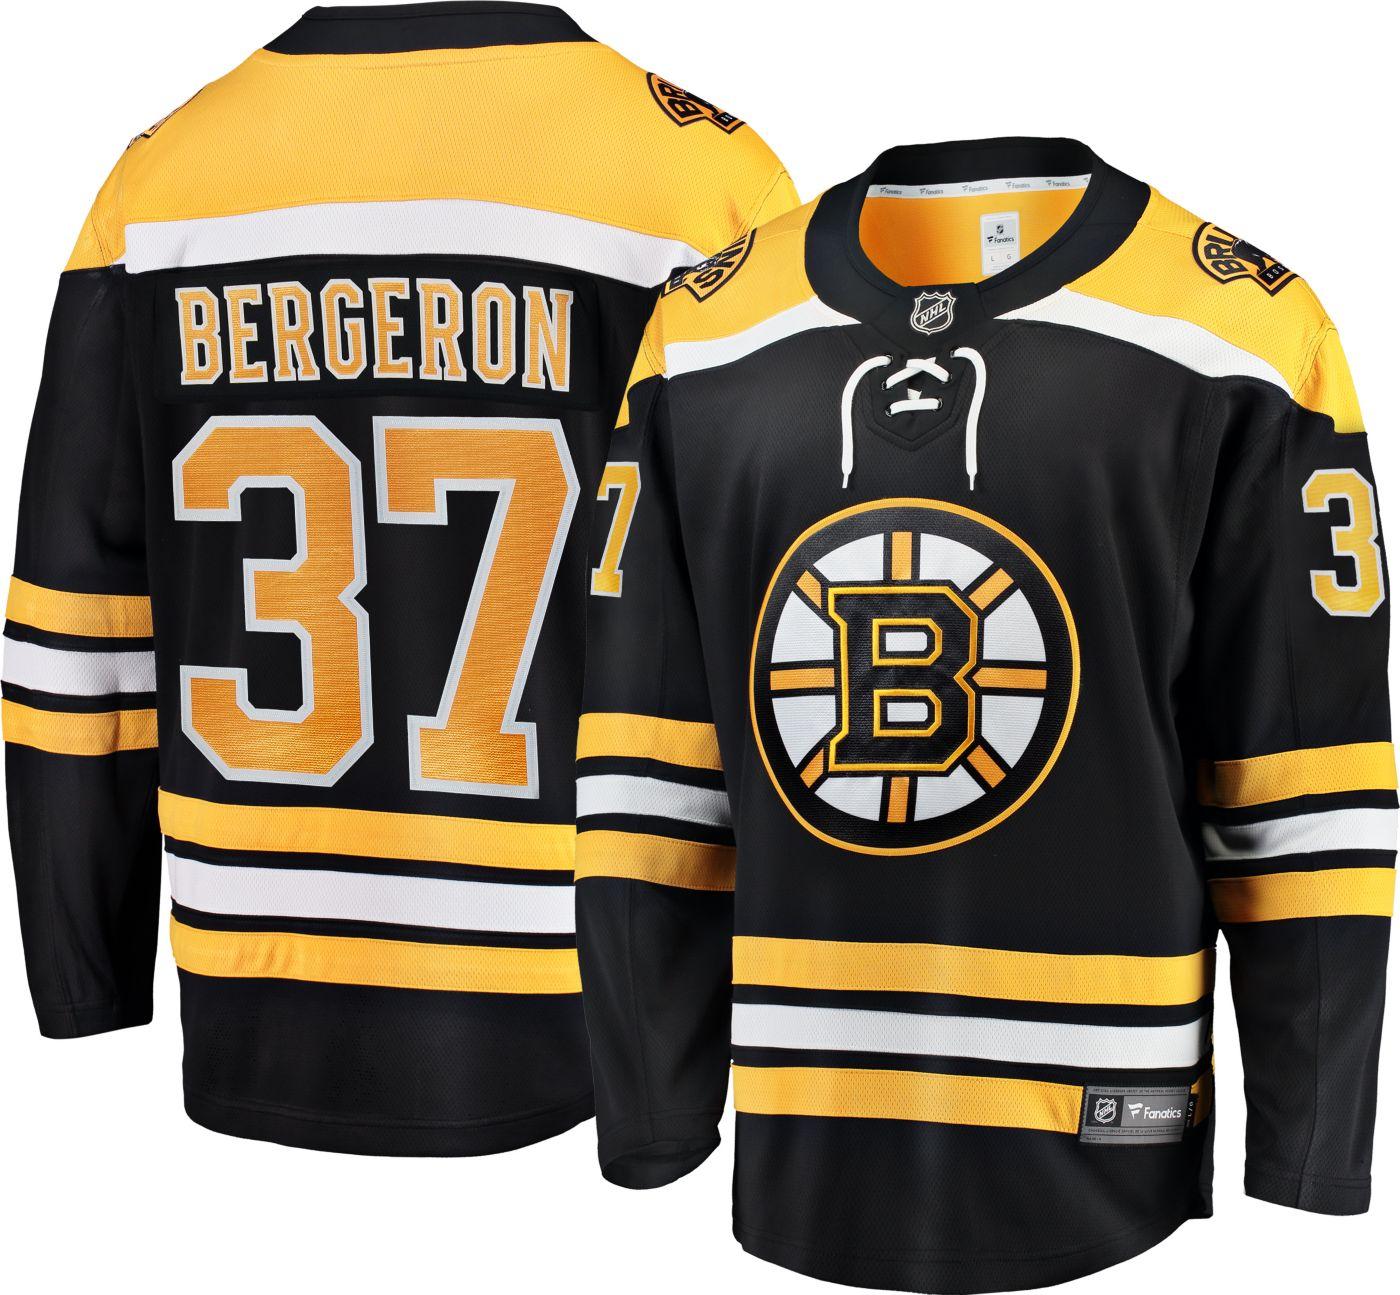 NHL Men's Boston Bruins Patrice Bergeron #37 Breakaway Home Replica Jersey